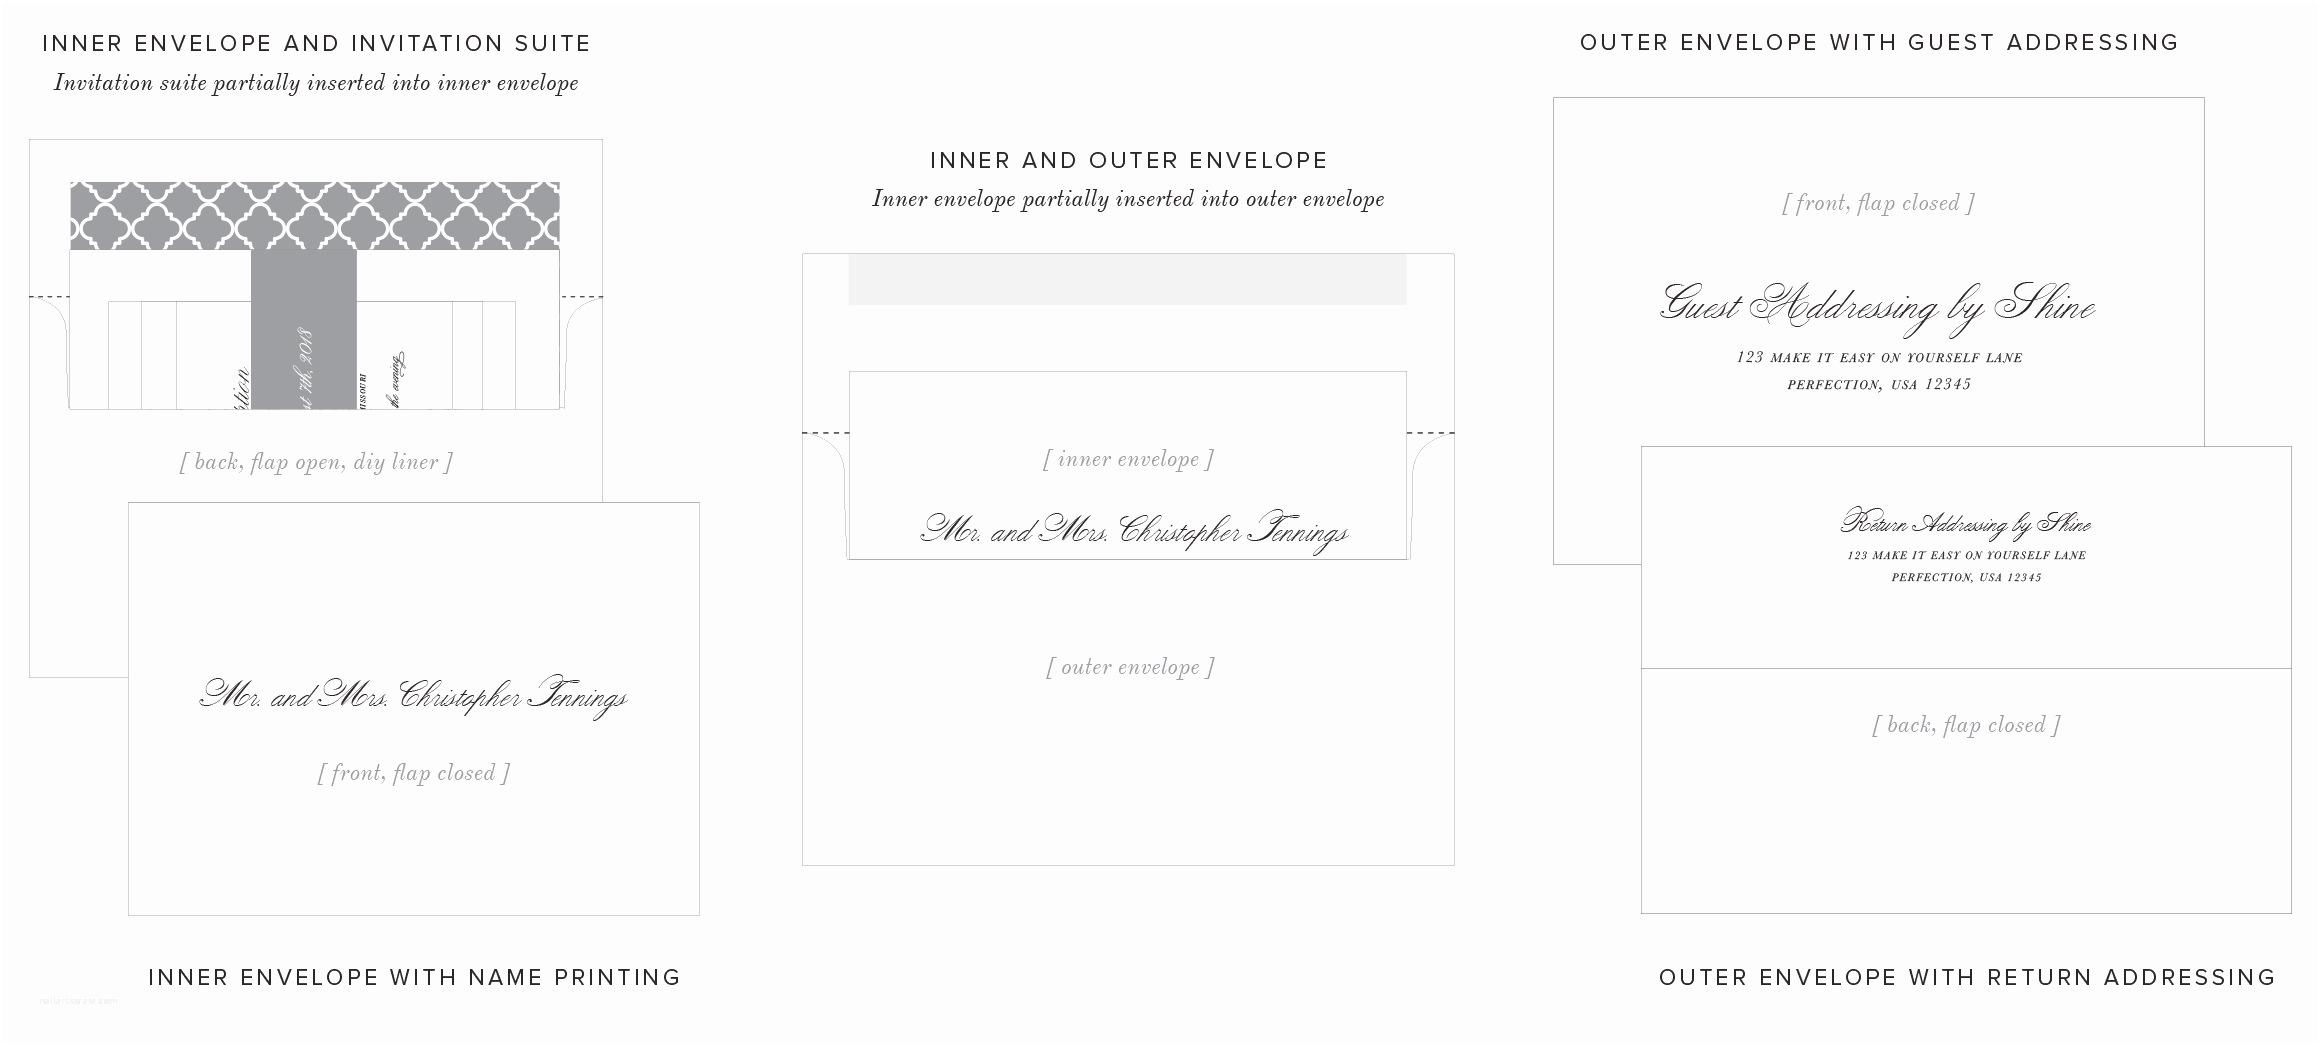 Inner and Outer Envelope Sizes for Wedding Invitations Outer Envelope Wedding Invitation Yourweek Cae945eca25e